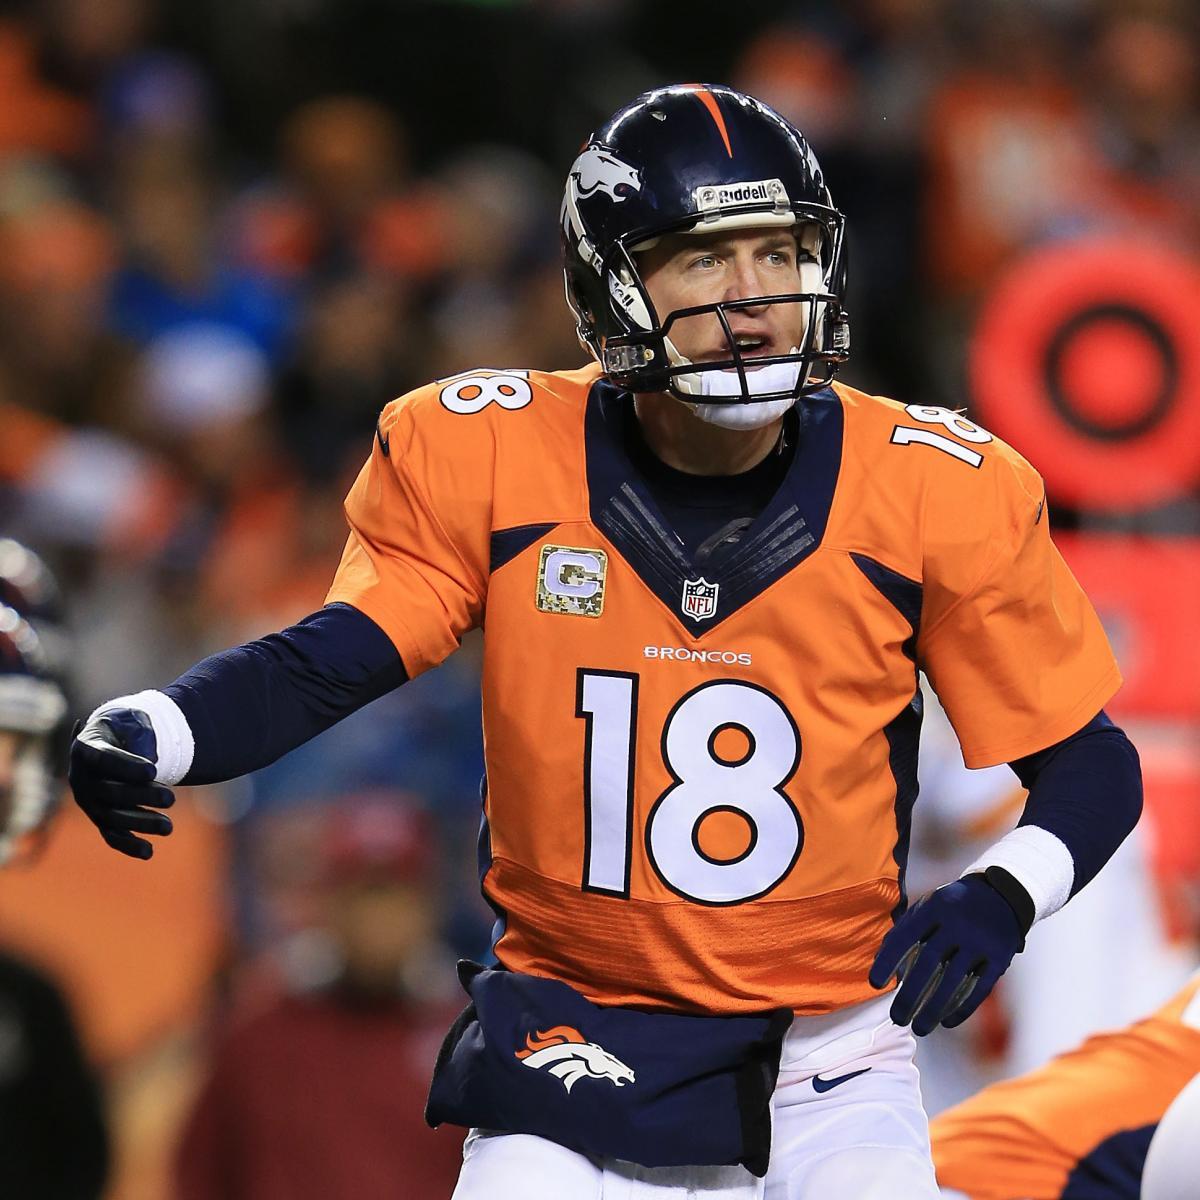 Pin by r-man on Super Bowl 48 | Broncos, Denver broncos